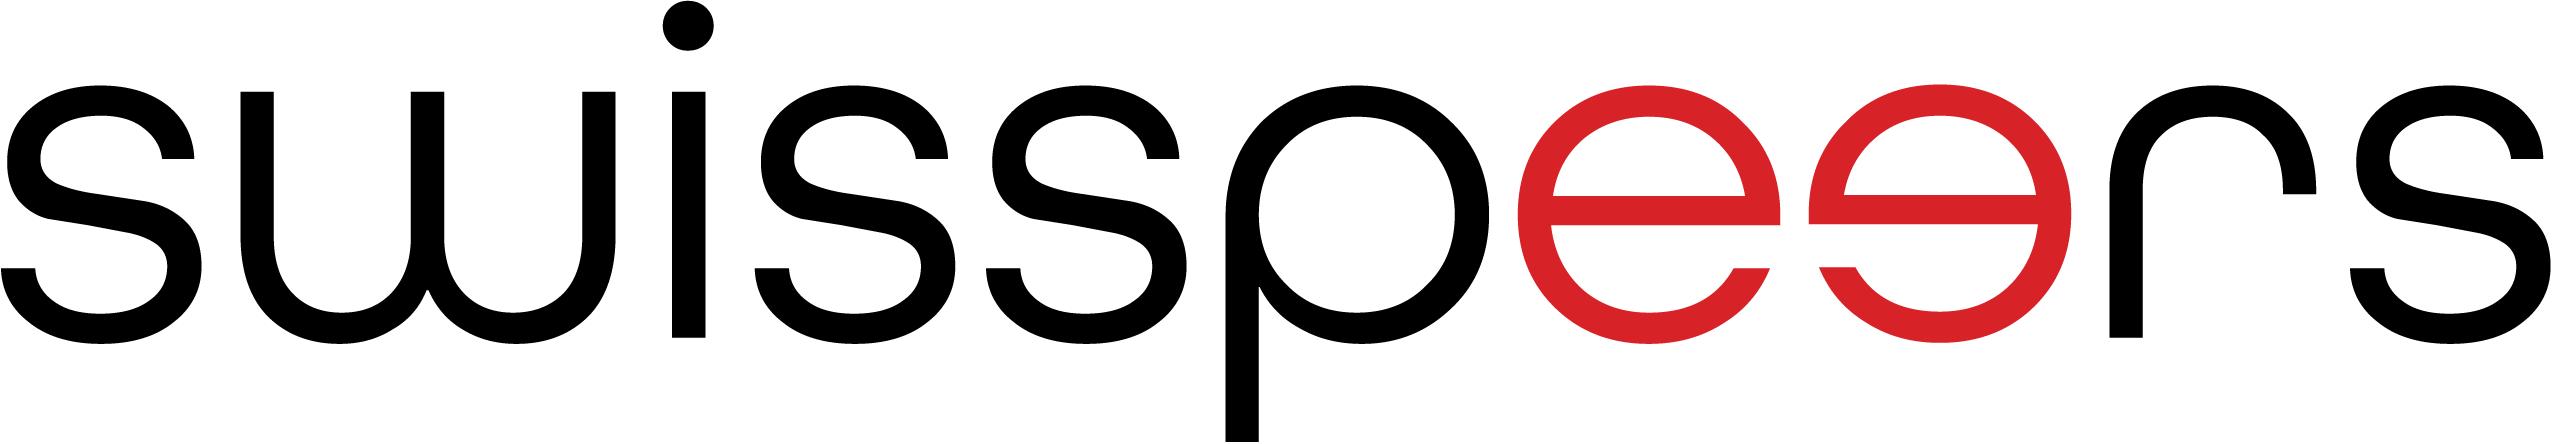 http://campaign-image.eu/zohocampaigns/9597000001628174_swisspeers_logo_transparent_orig.png